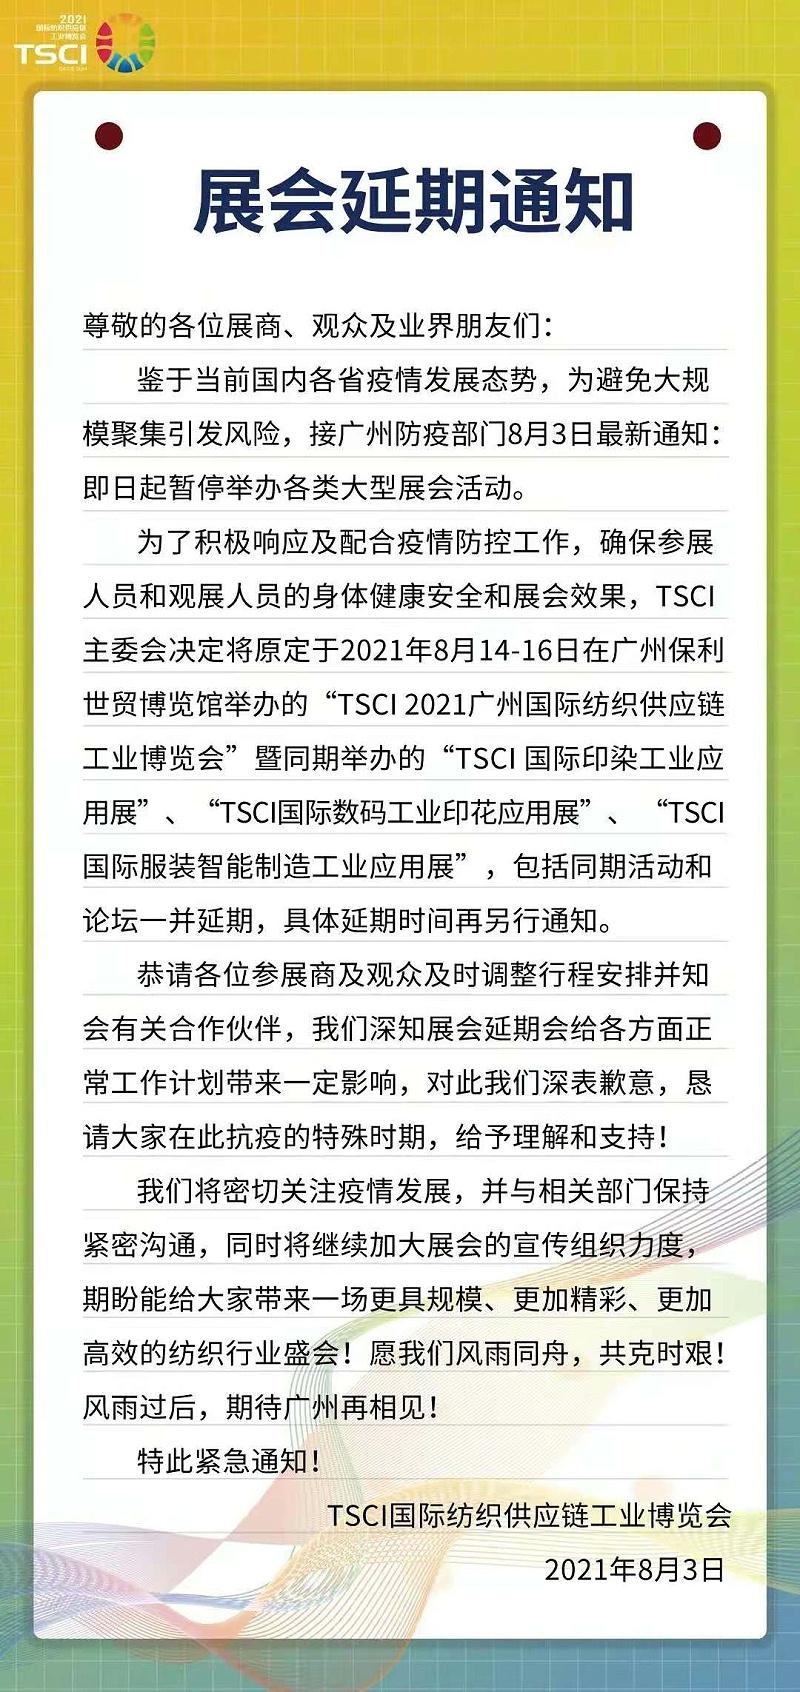 SCCI国家纺织供应链博览会延期通知